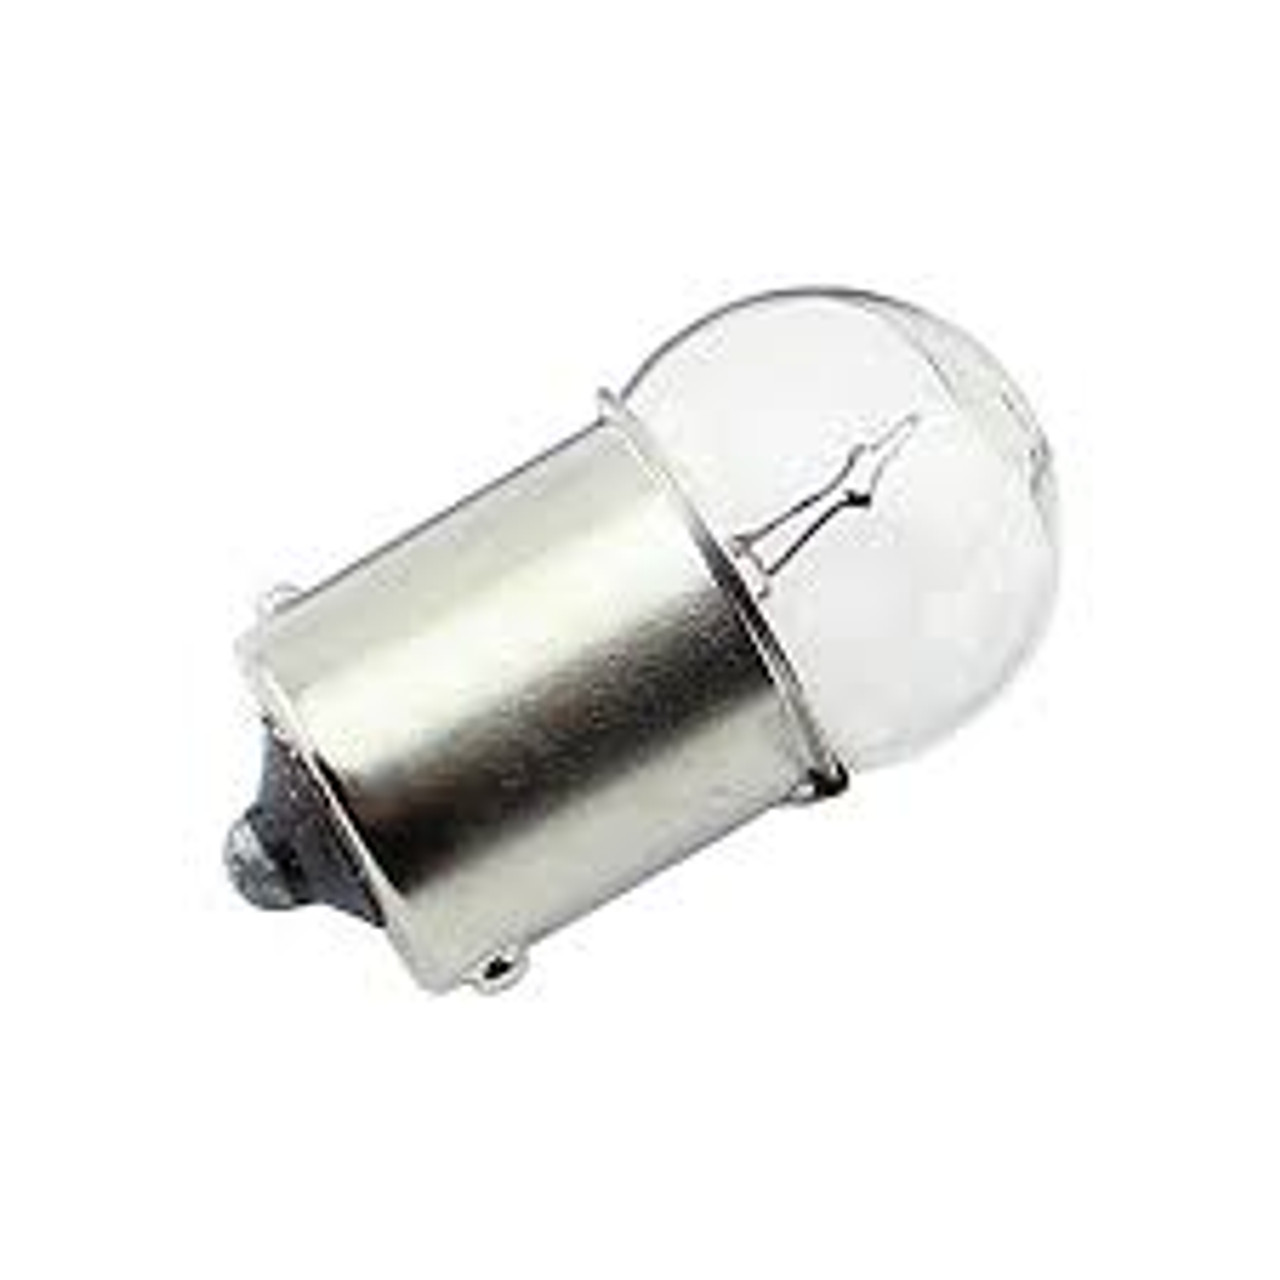 Bulb 12V 10W BA15S, e-marked (with small bulb, e.g. for Mini-Indicators)